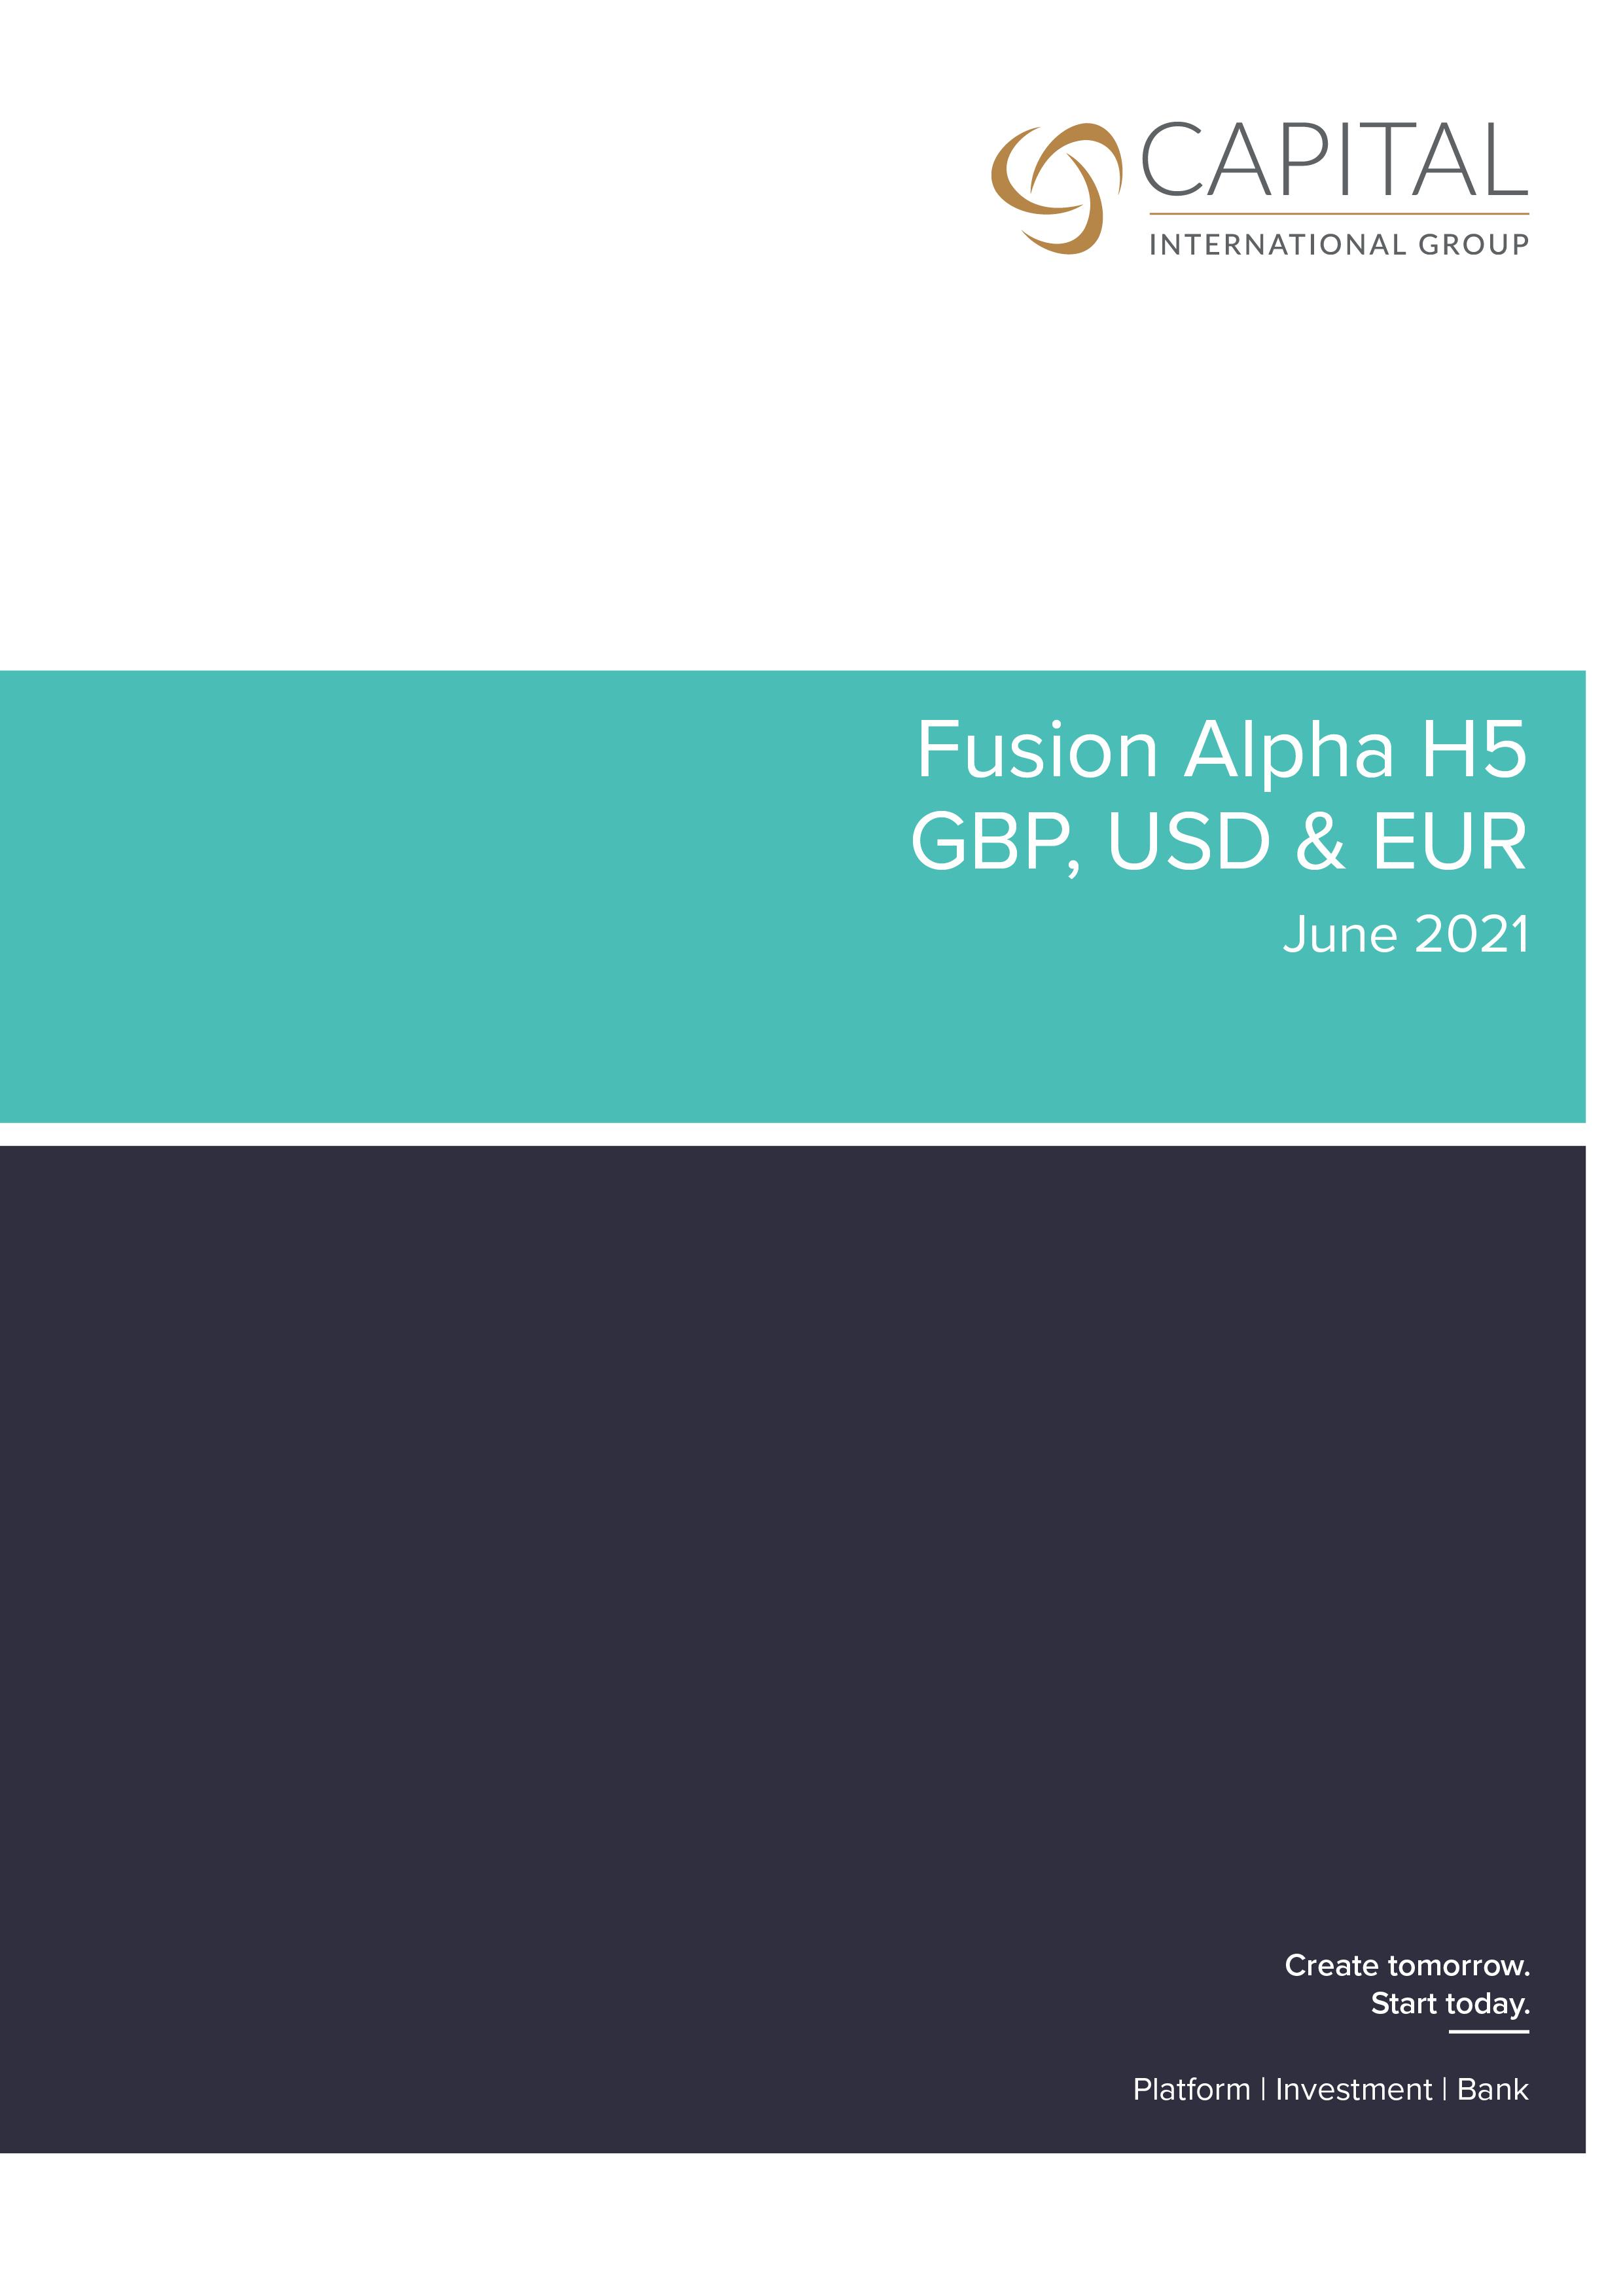 Fusion Alpha H5 June 2021